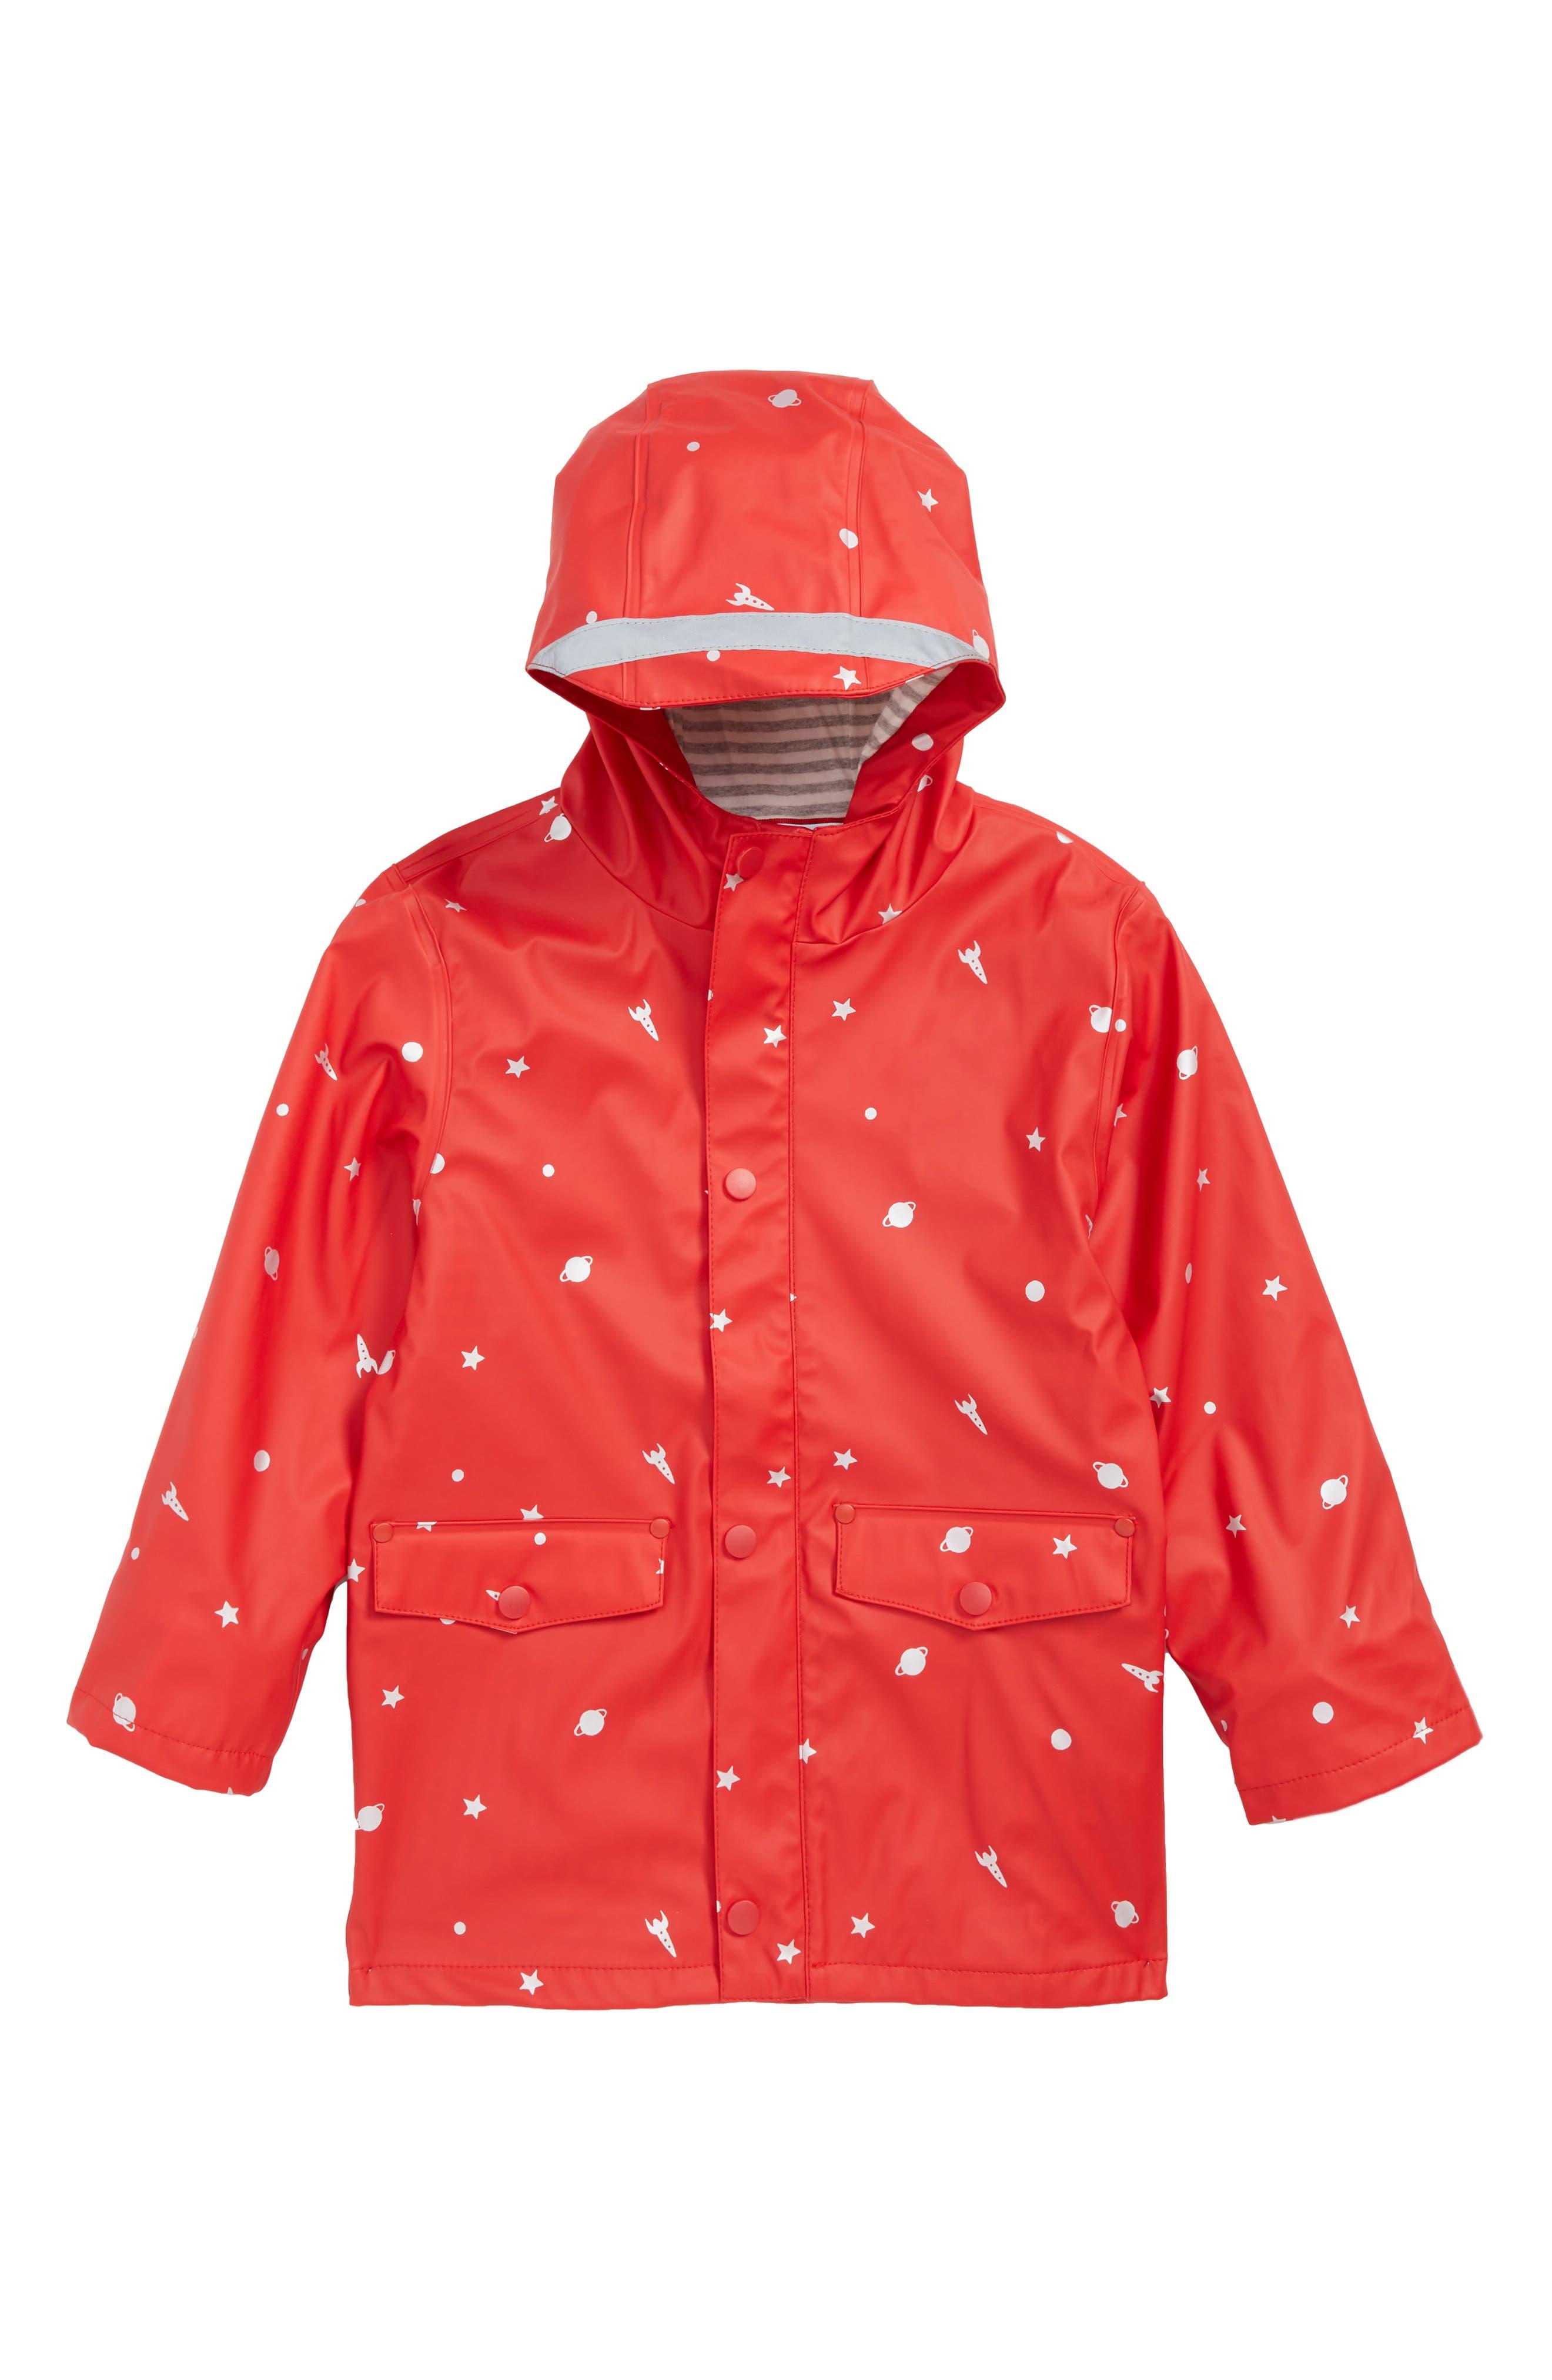 Fisherman's Waterproof Jacket,                             Main thumbnail 1, color,                             614